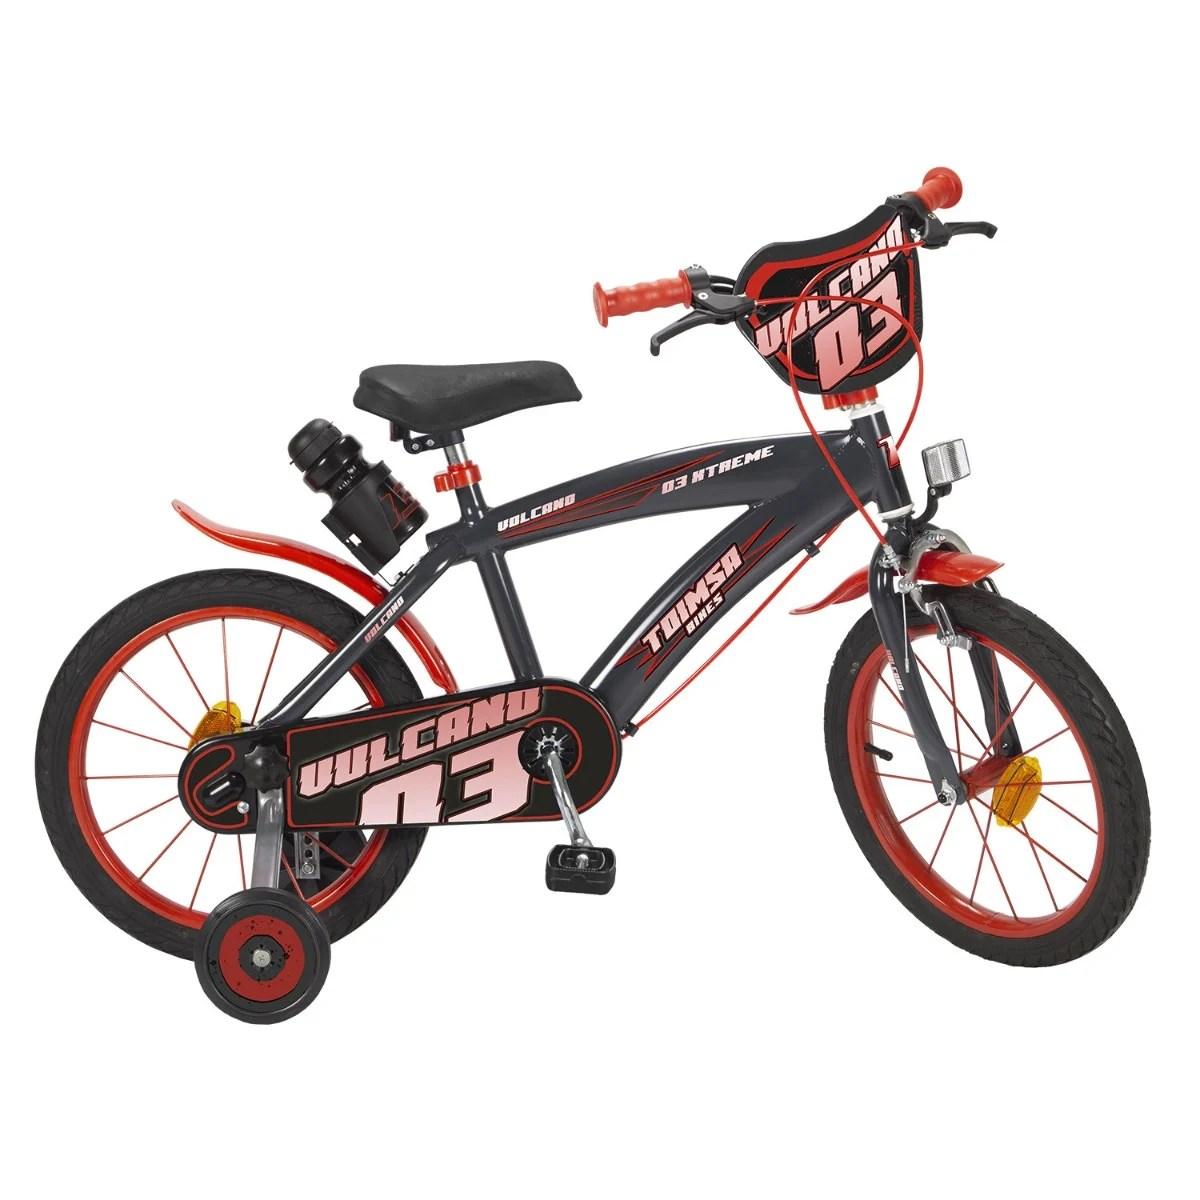 Bicicleta copii Toimsa Vulcano, 16 inch